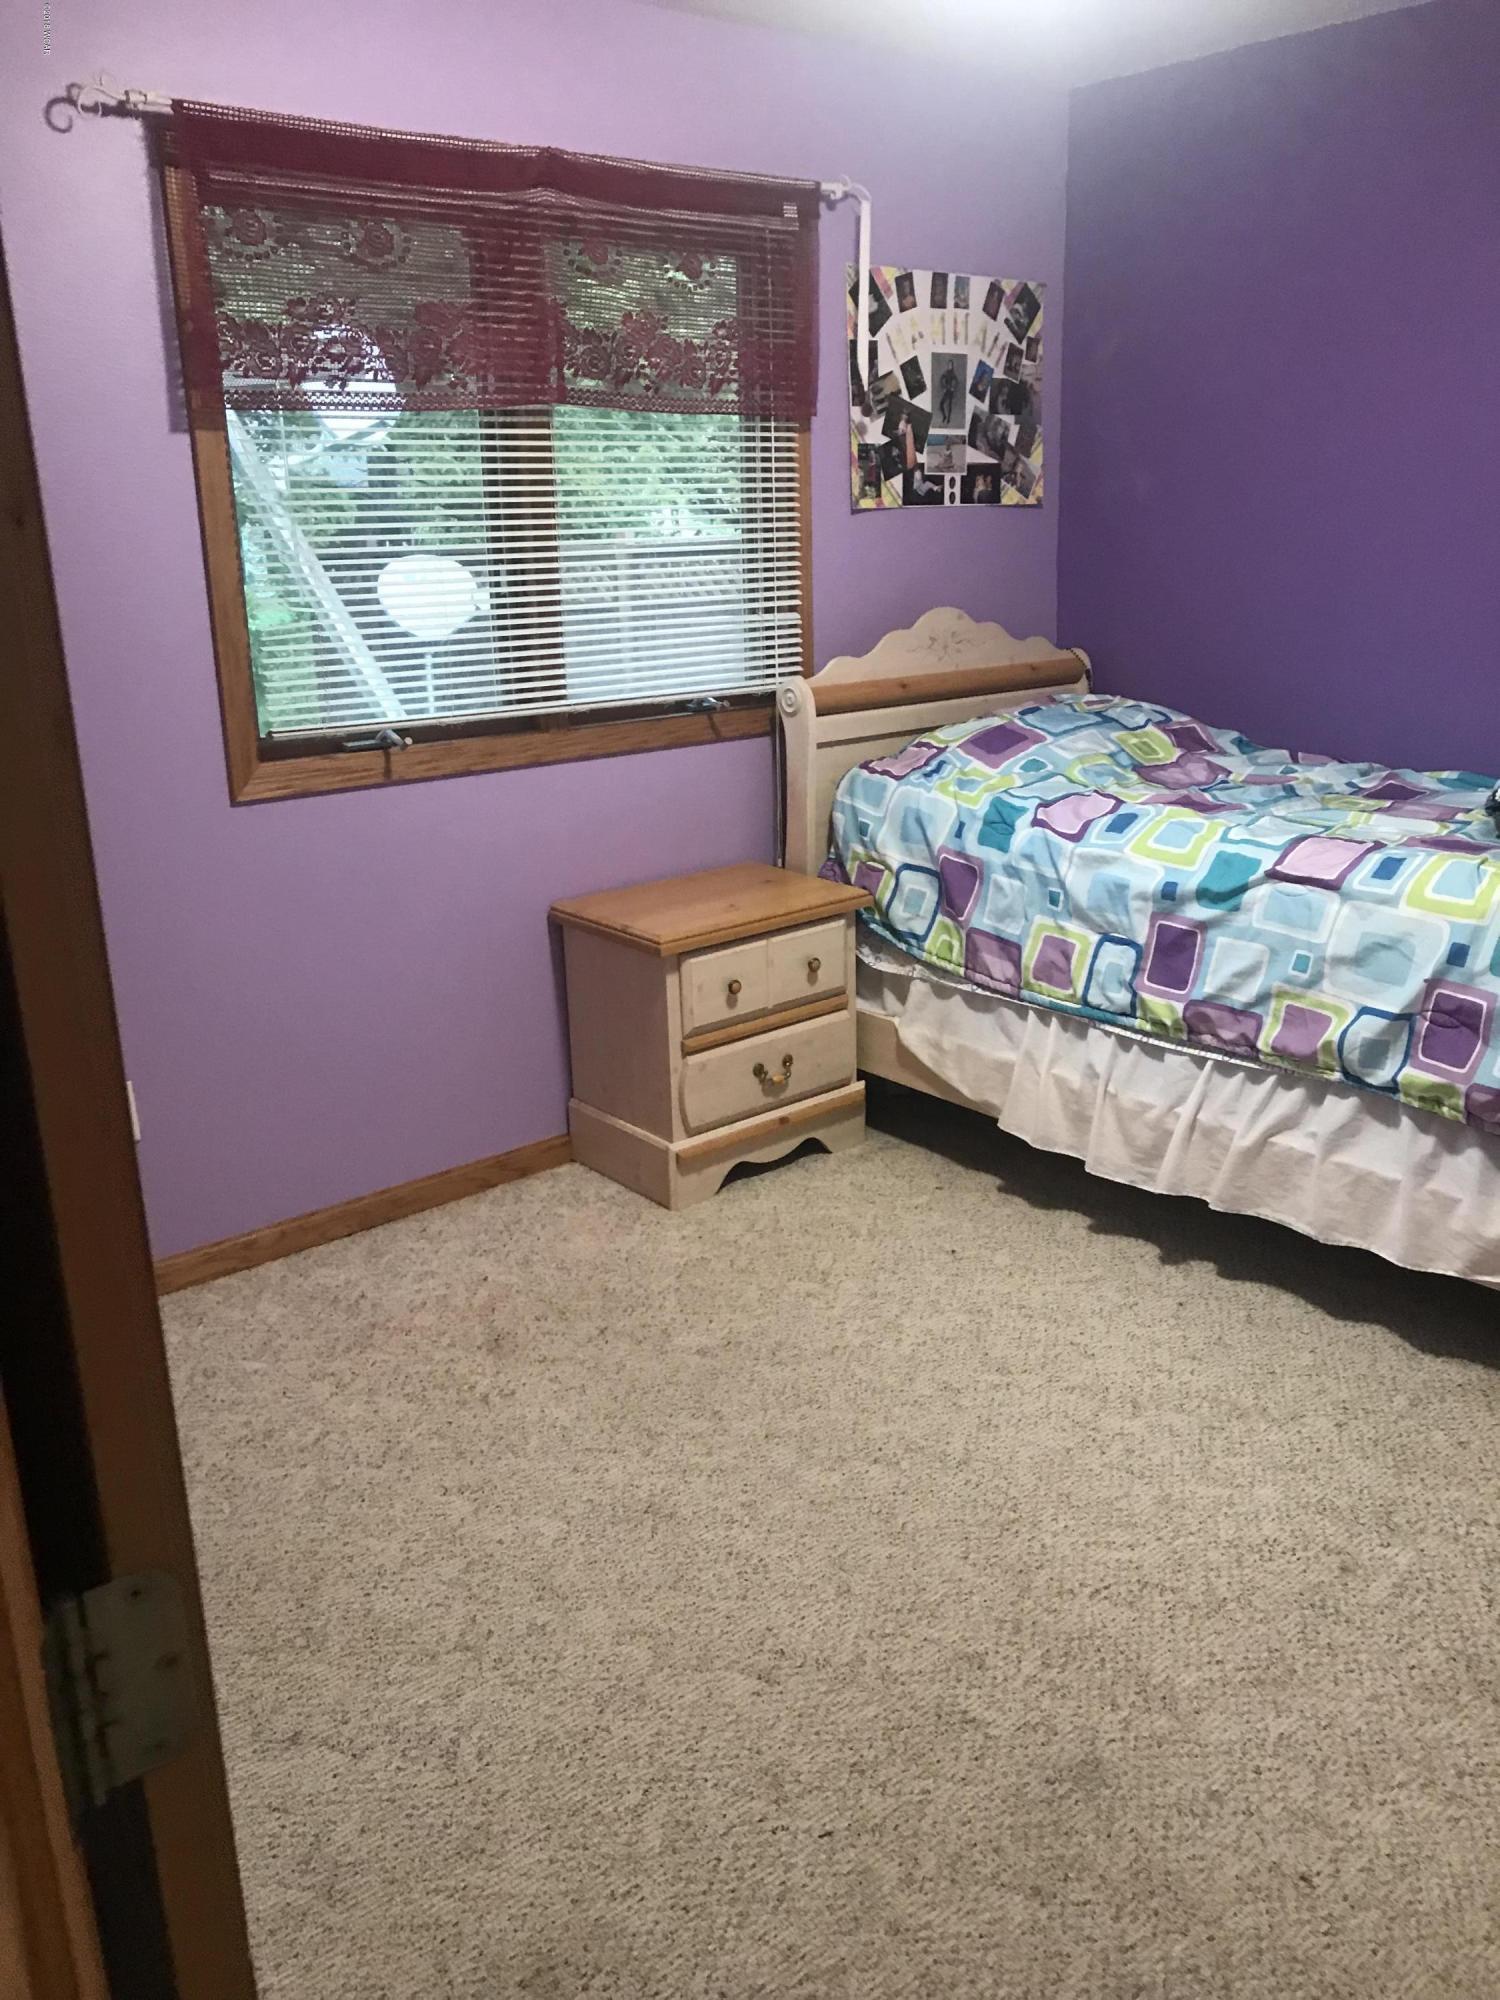 308 Hillcrest Avenue,Olivia,3 Bedrooms Bedrooms,2 BathroomsBathrooms,Single Family,Hillcrest Avenue,6032597